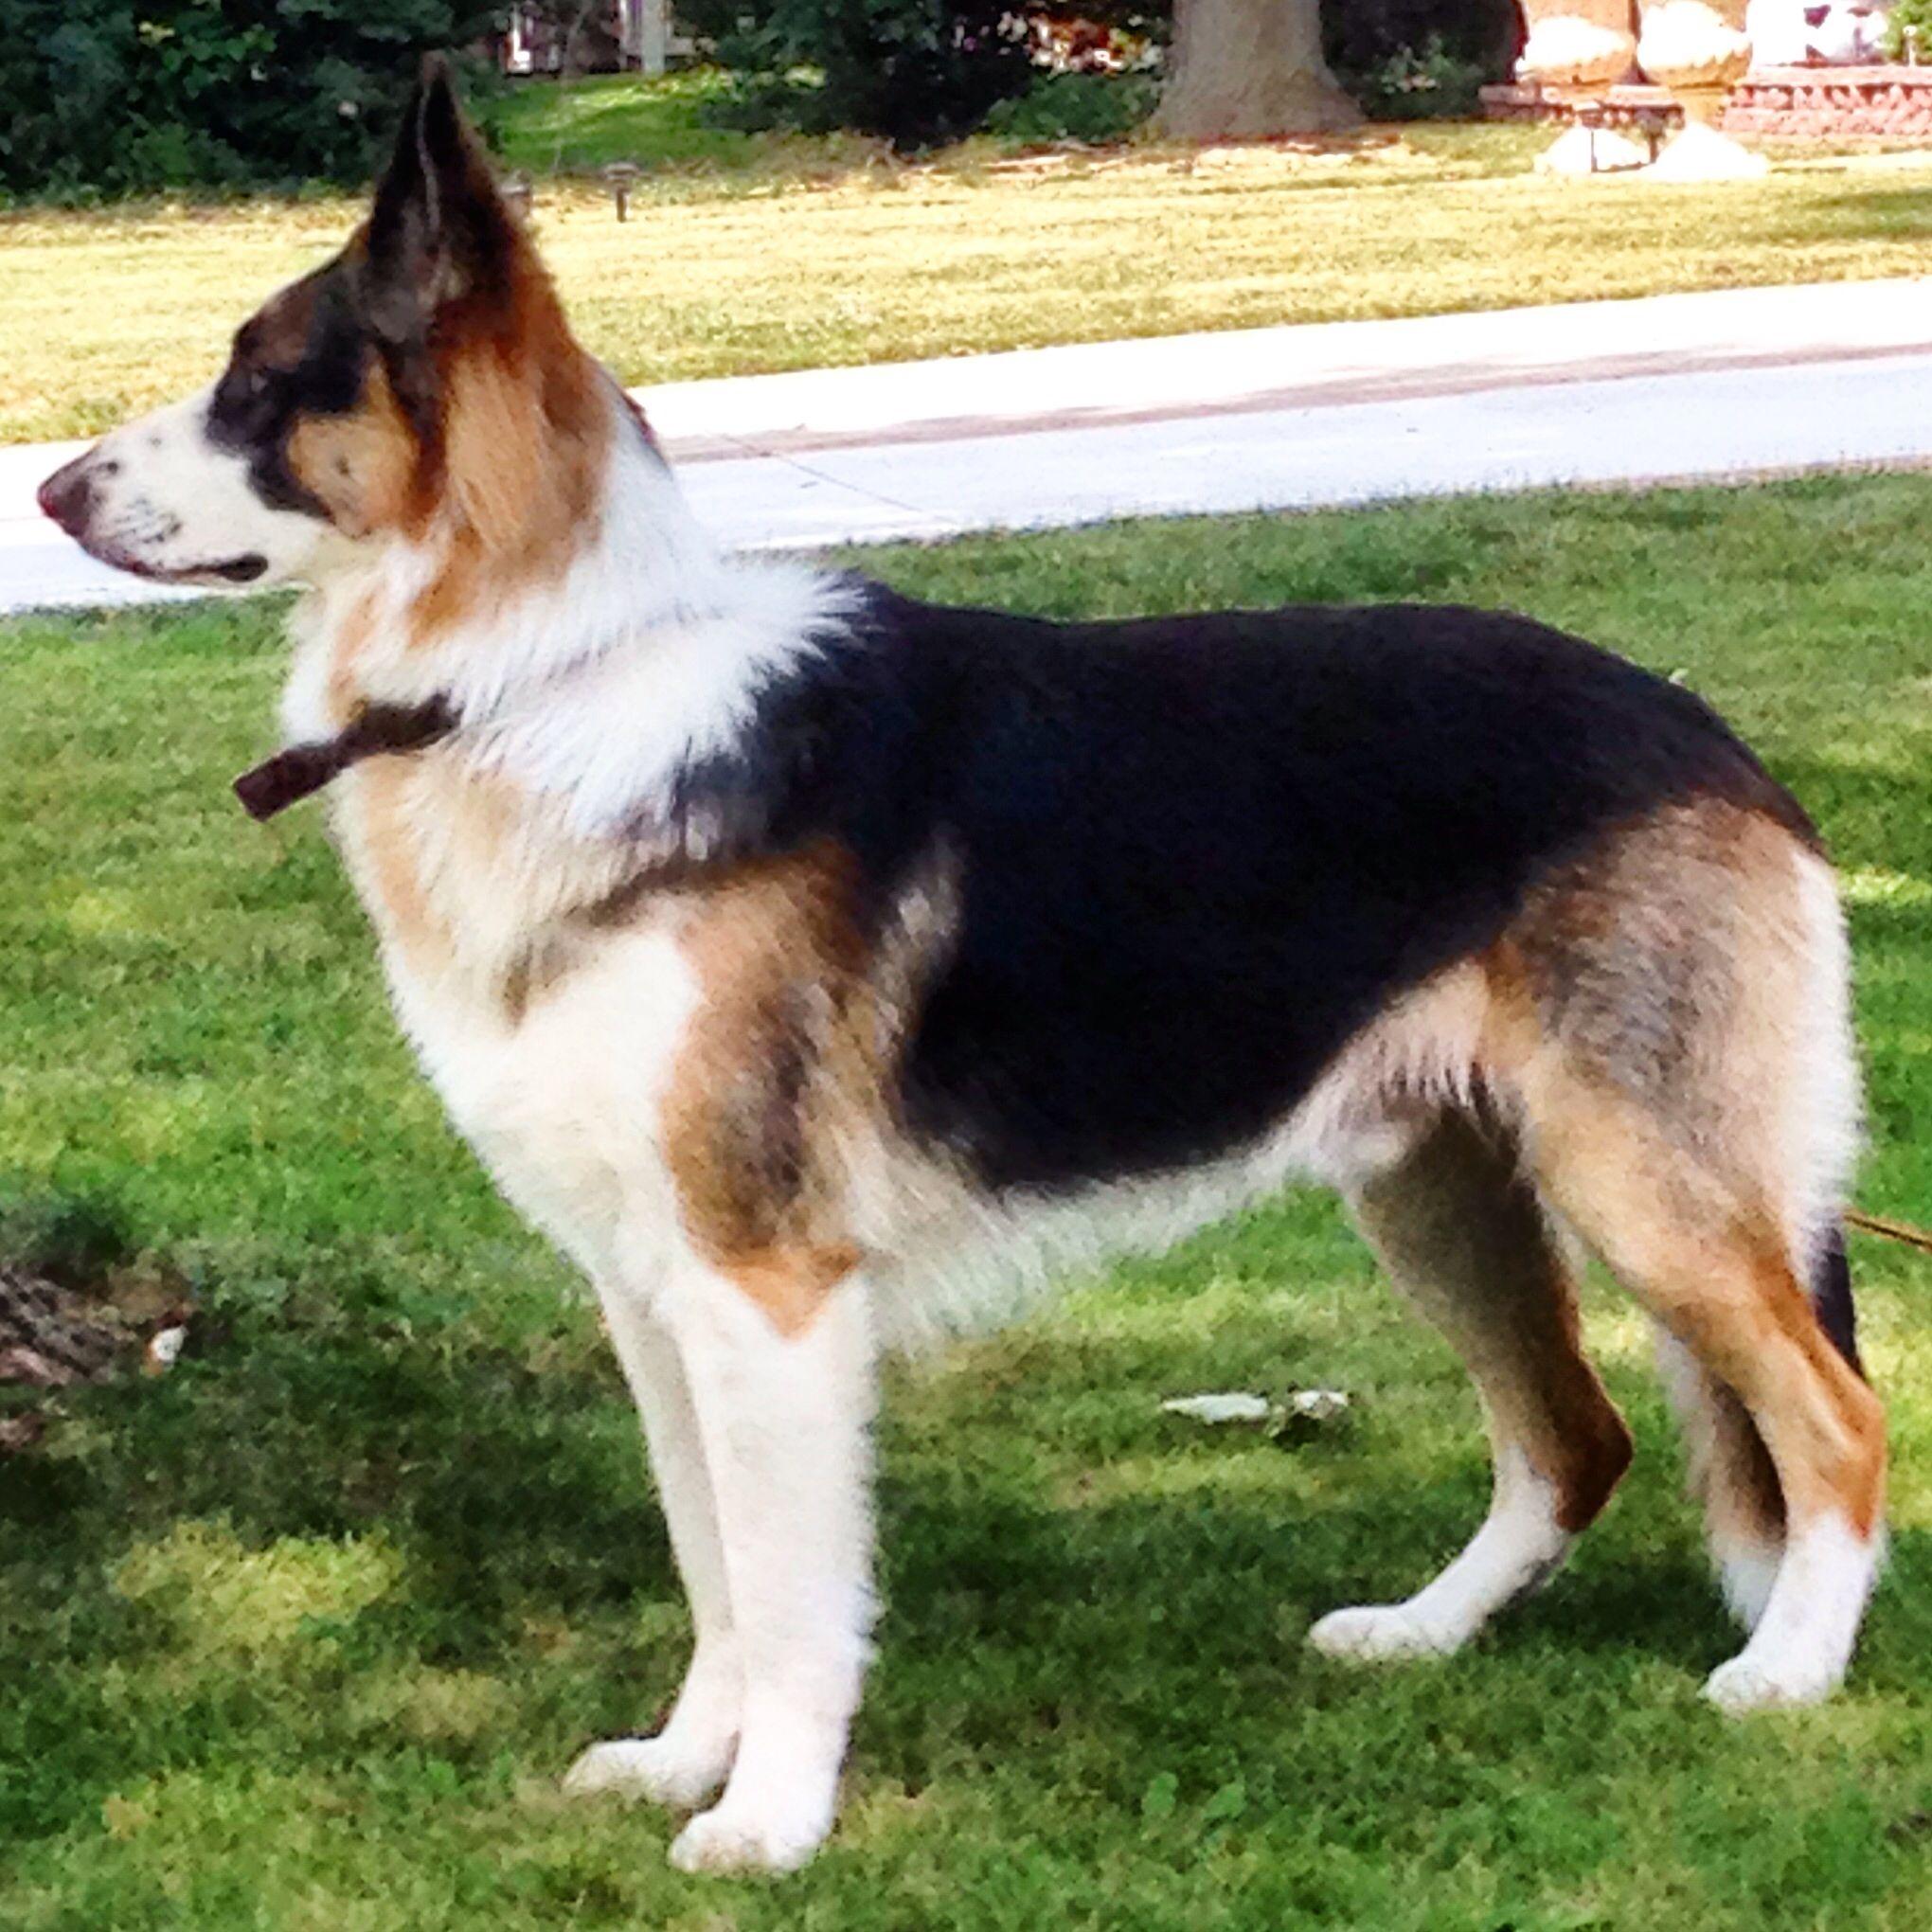 Hund Saugetier Haustier Tier Welpe Niedlich Beaglehunderassen Hund Labrador Hundewelpen Welpen Labrador Wel Welpen Hunderassen Kleine Hunde